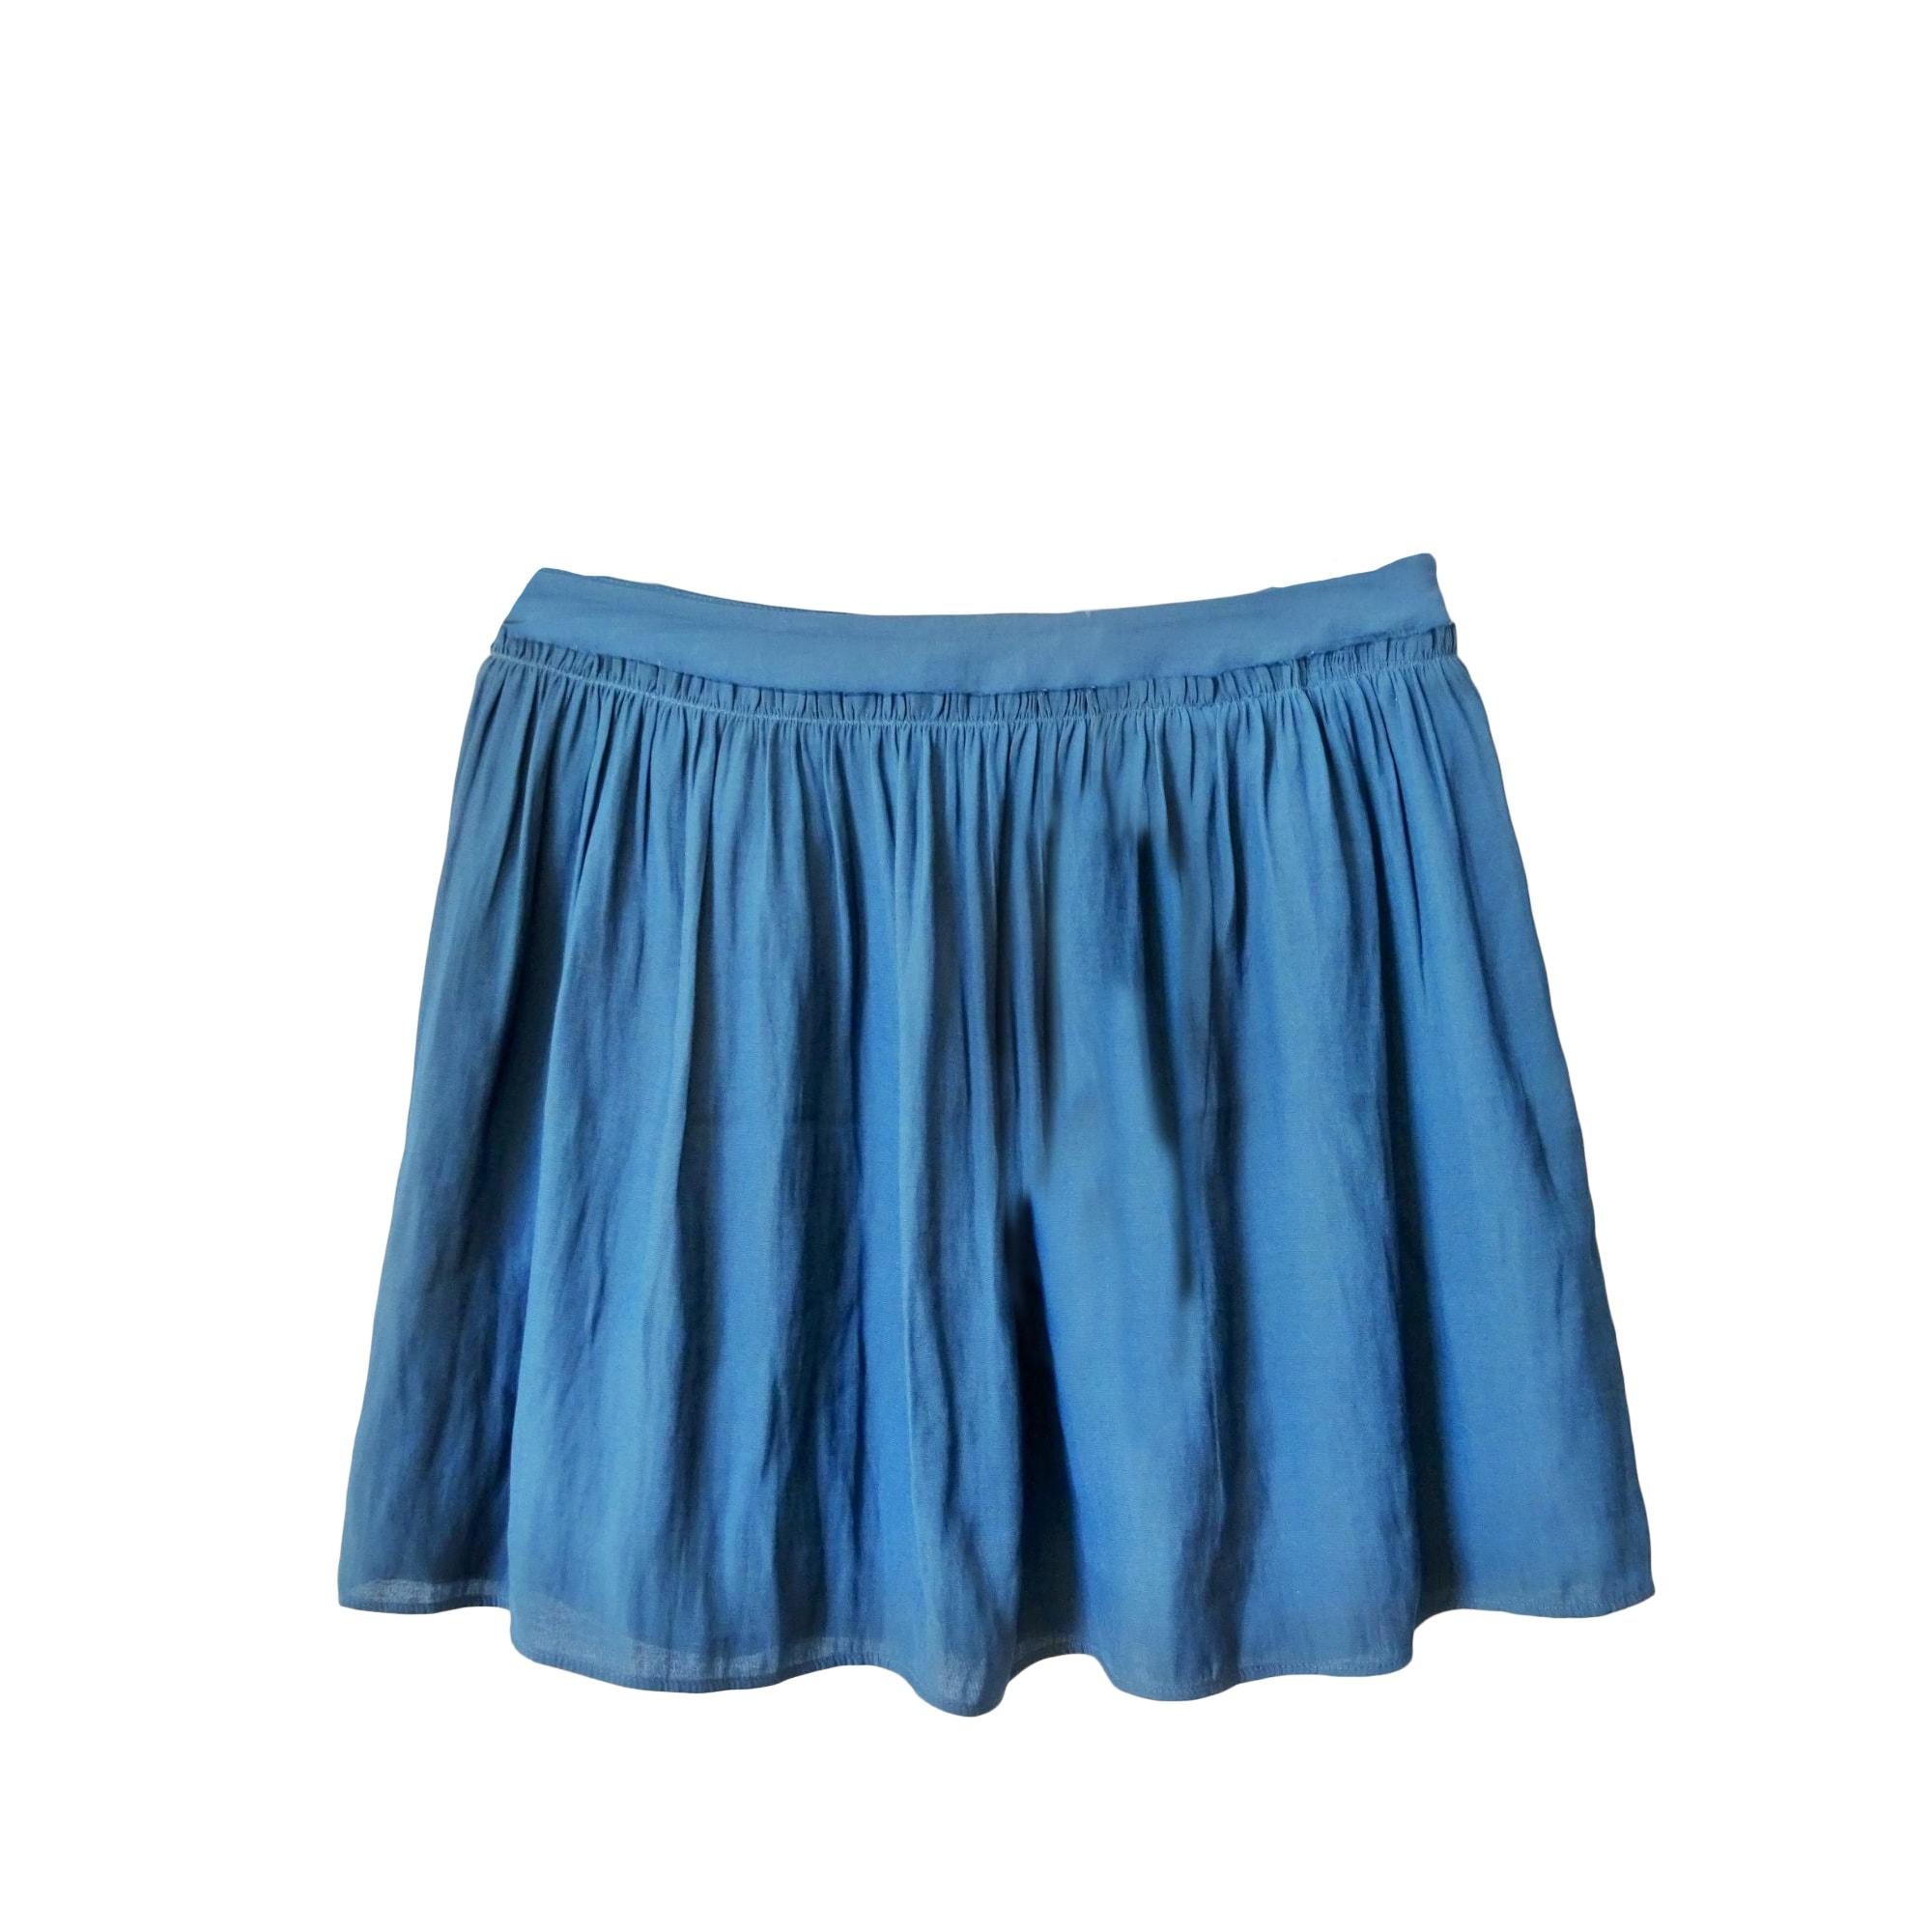 Jupe courte ZADIG & VOLTAIRE Bleu, bleu marine, bleu turquoise